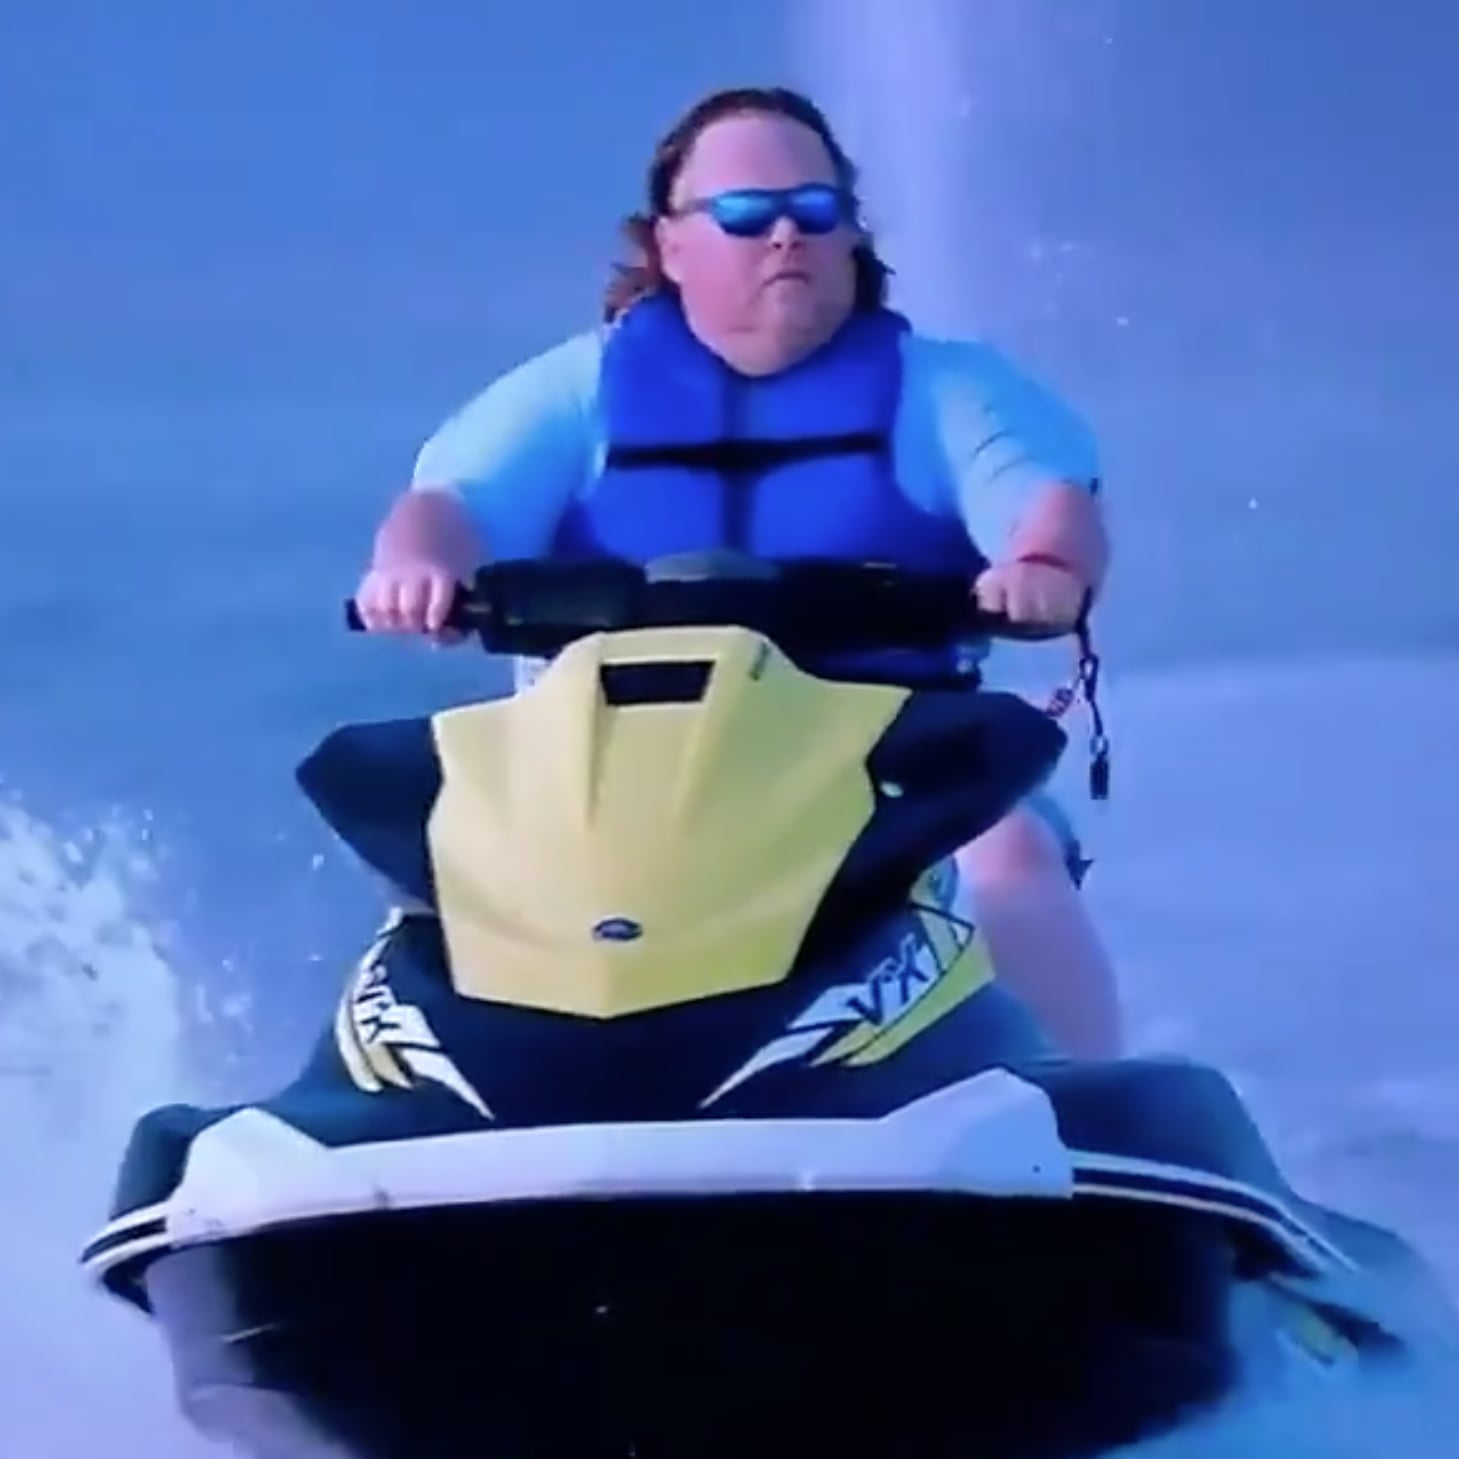 Tiger King Memes Inspired by James Garretson's Jet Ski Scene ...